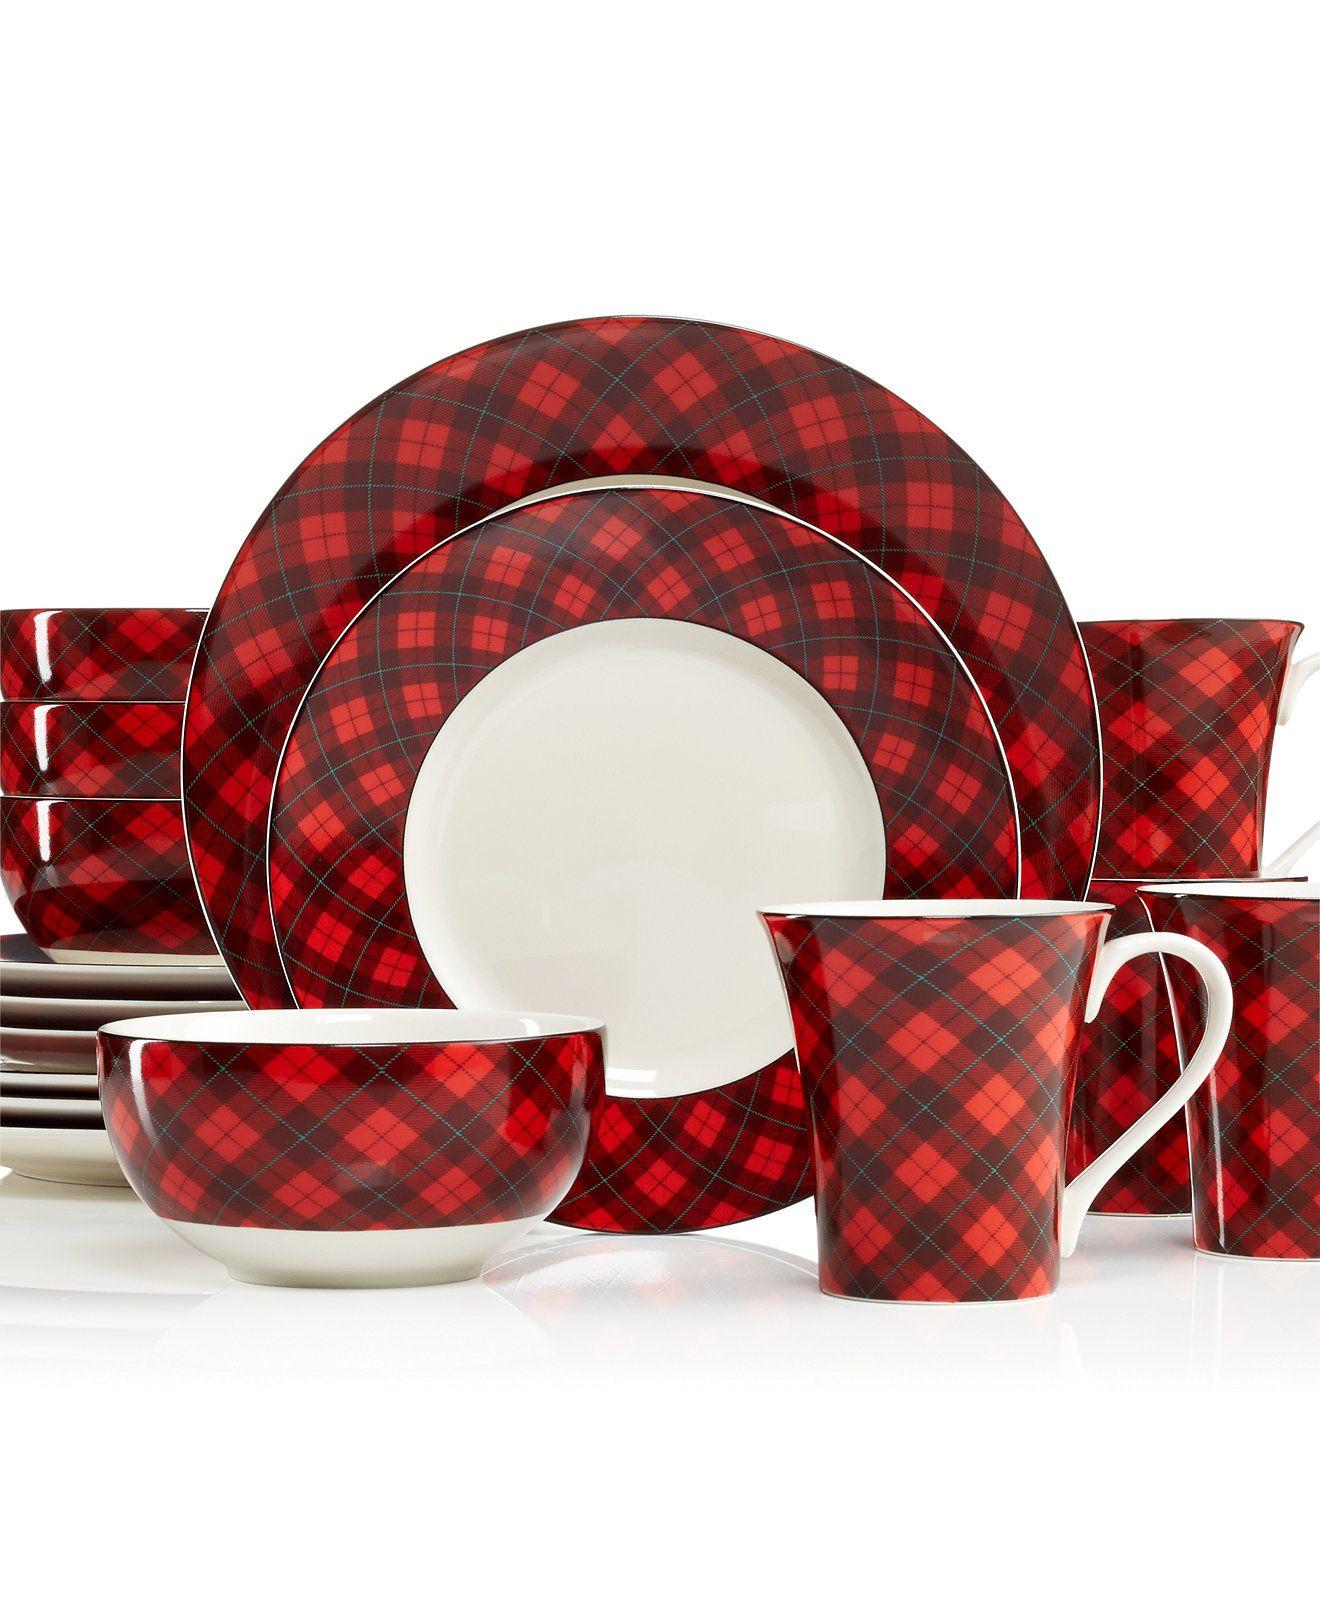 Christmas China  222 Fifth Christmas Plaid Dinnerware Set, Service For 4   Casual Dinnerware  Dining & Entertaining  Macy's